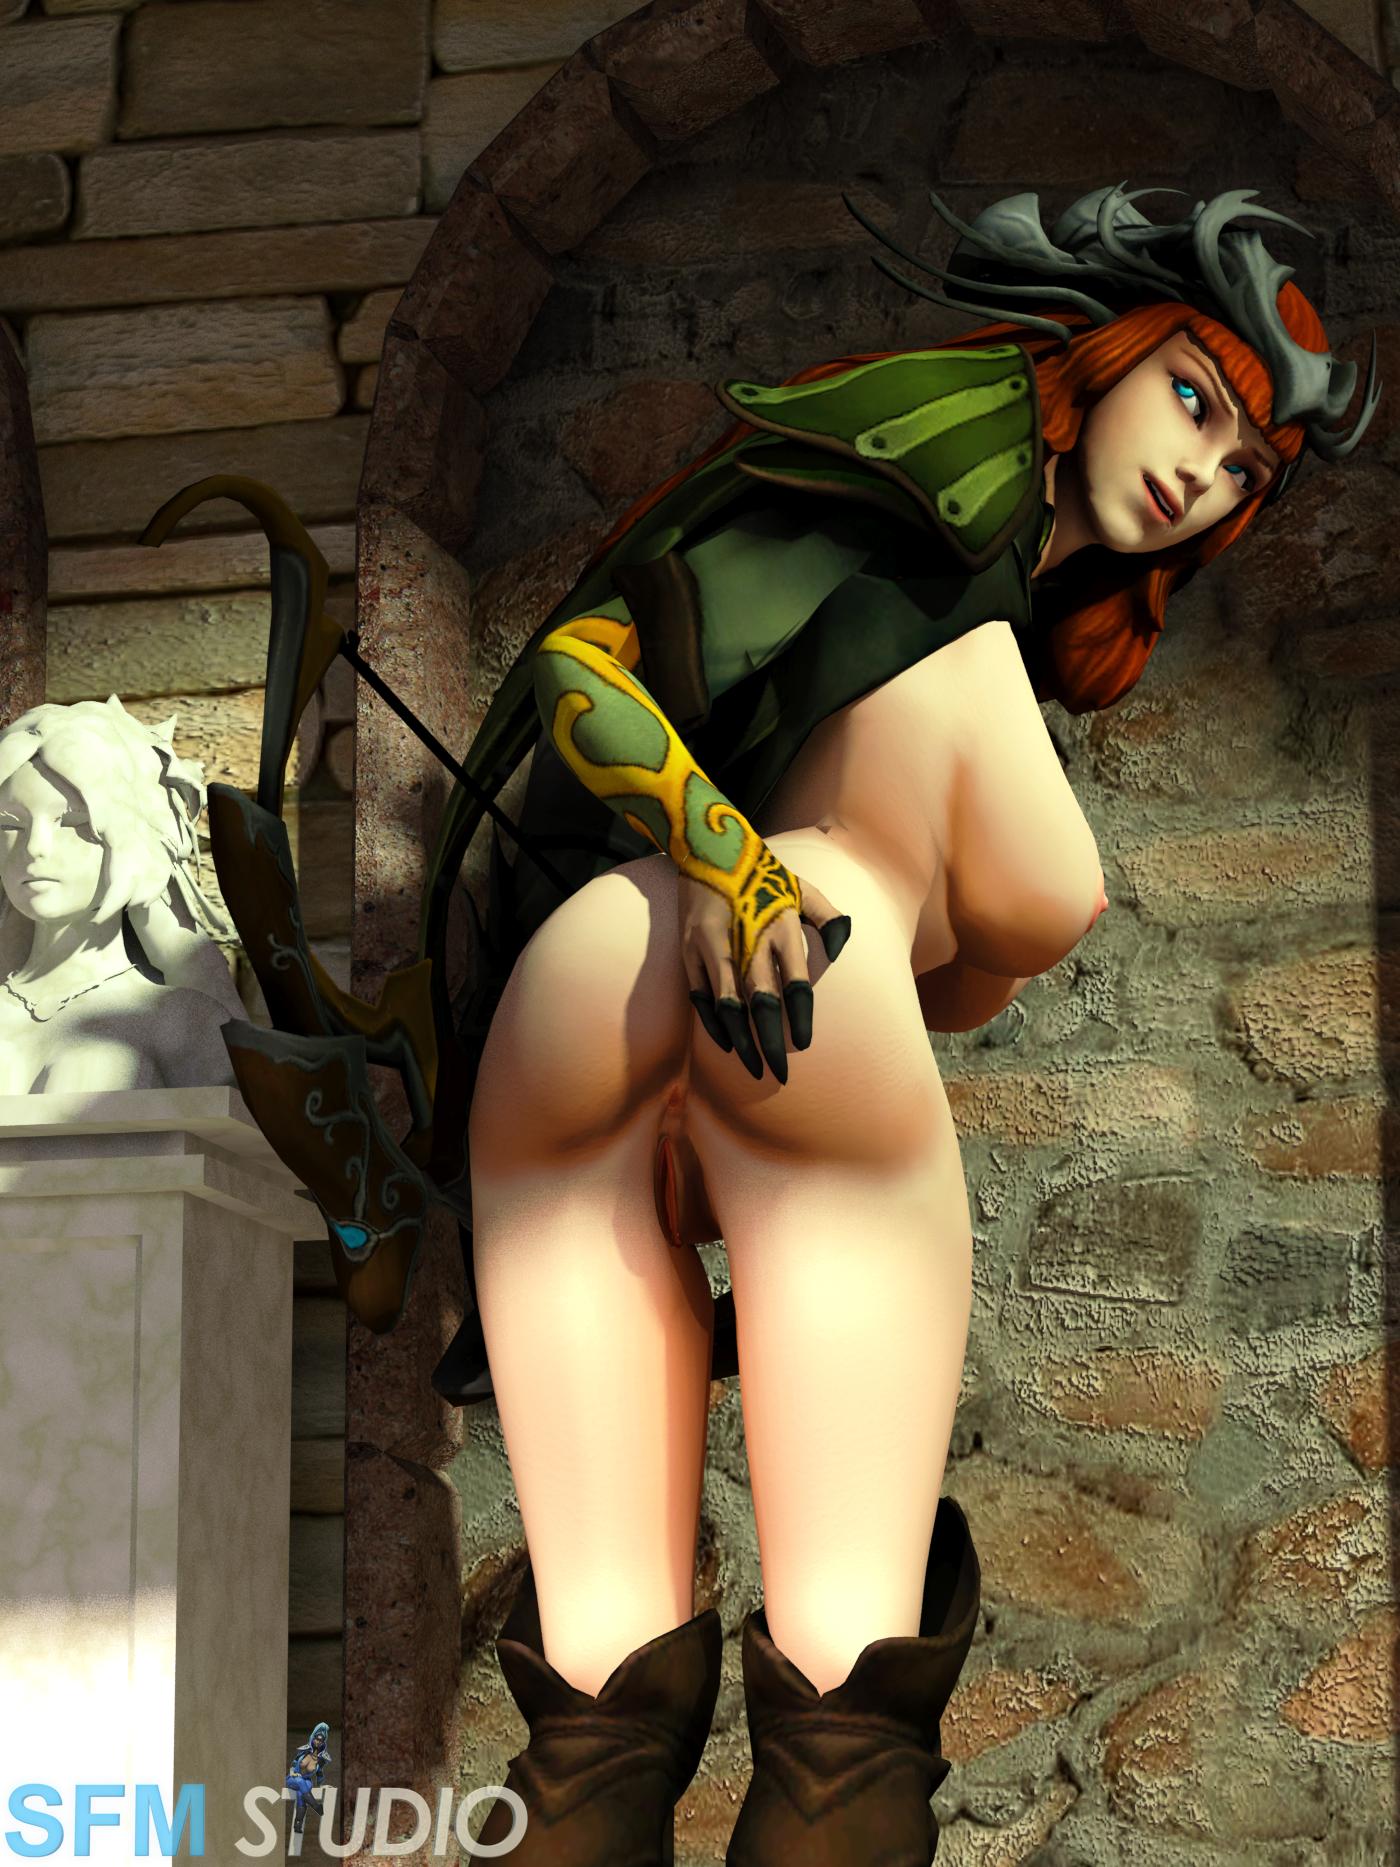 image Aphrodite artemis neith and isis lesbian orgy sfm